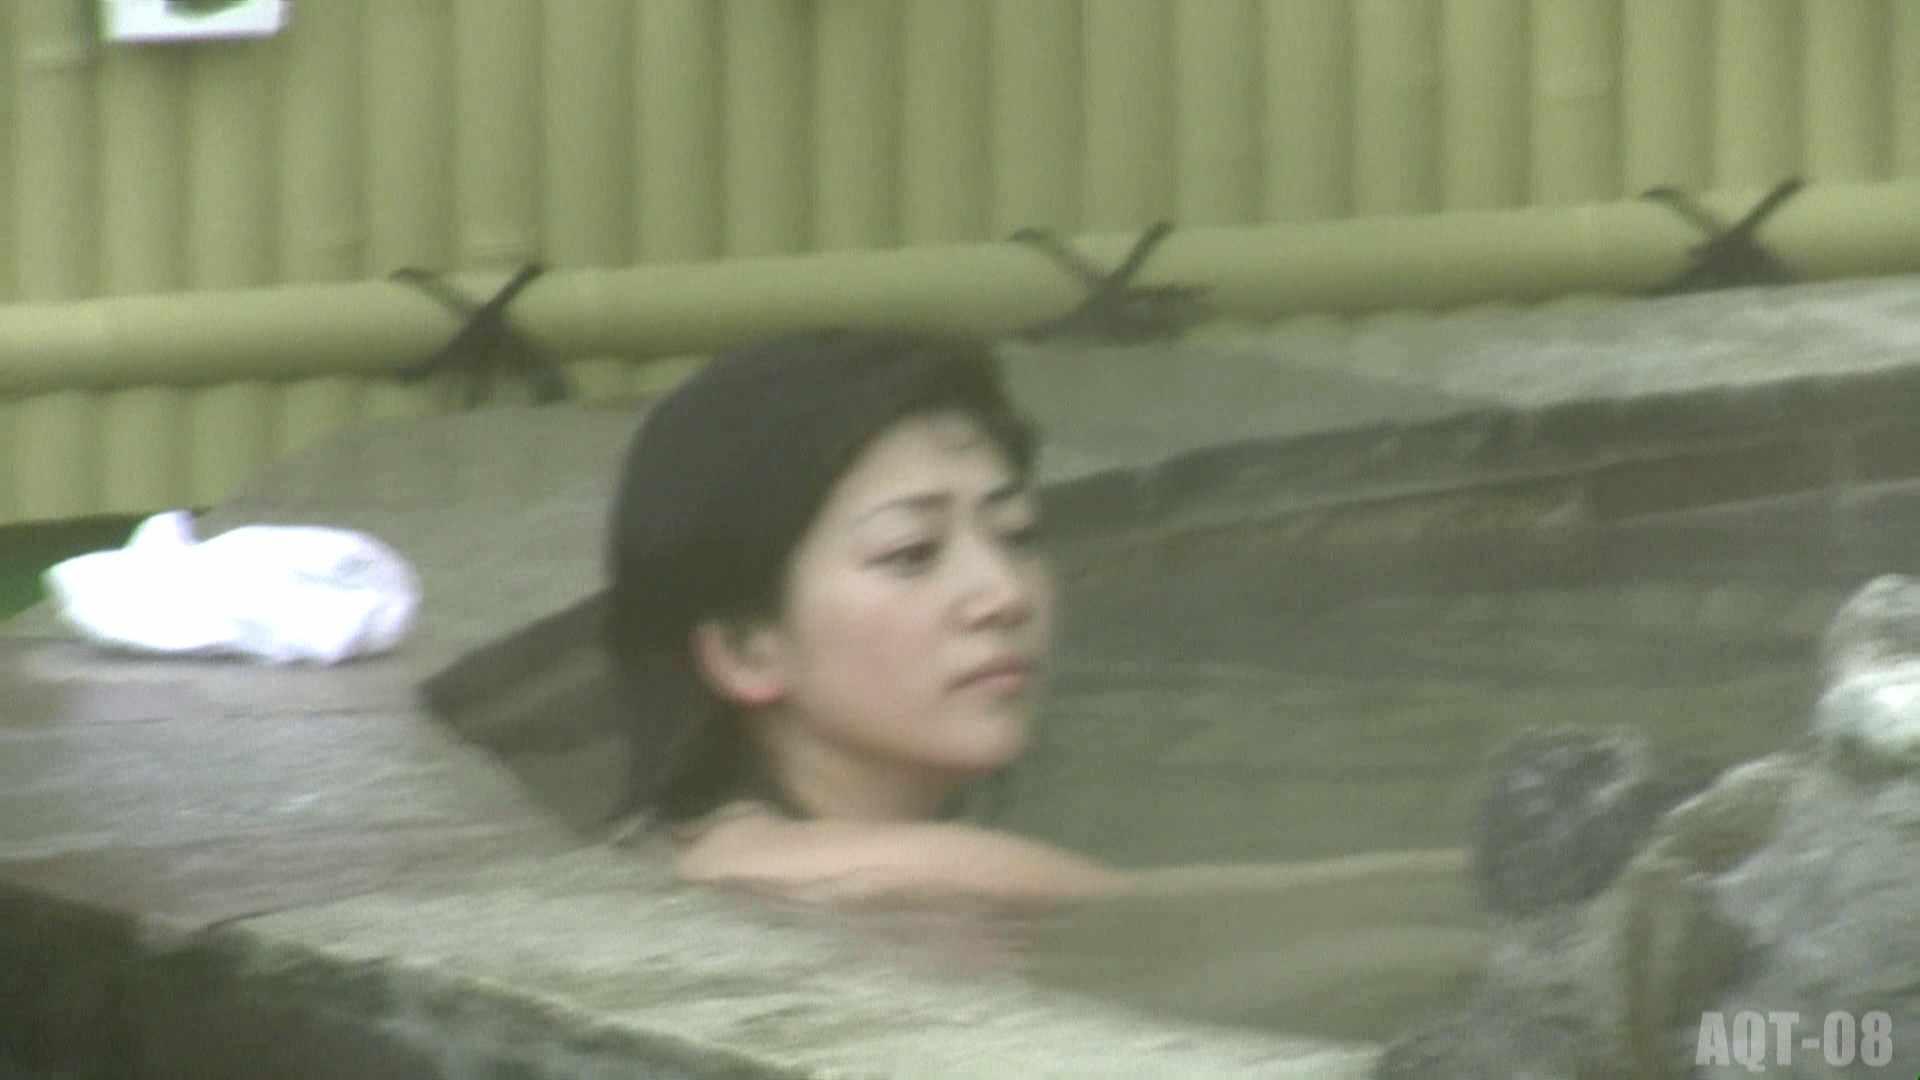 Aquaな露天風呂Vol.776 盗撮 エロ無料画像 108画像 83